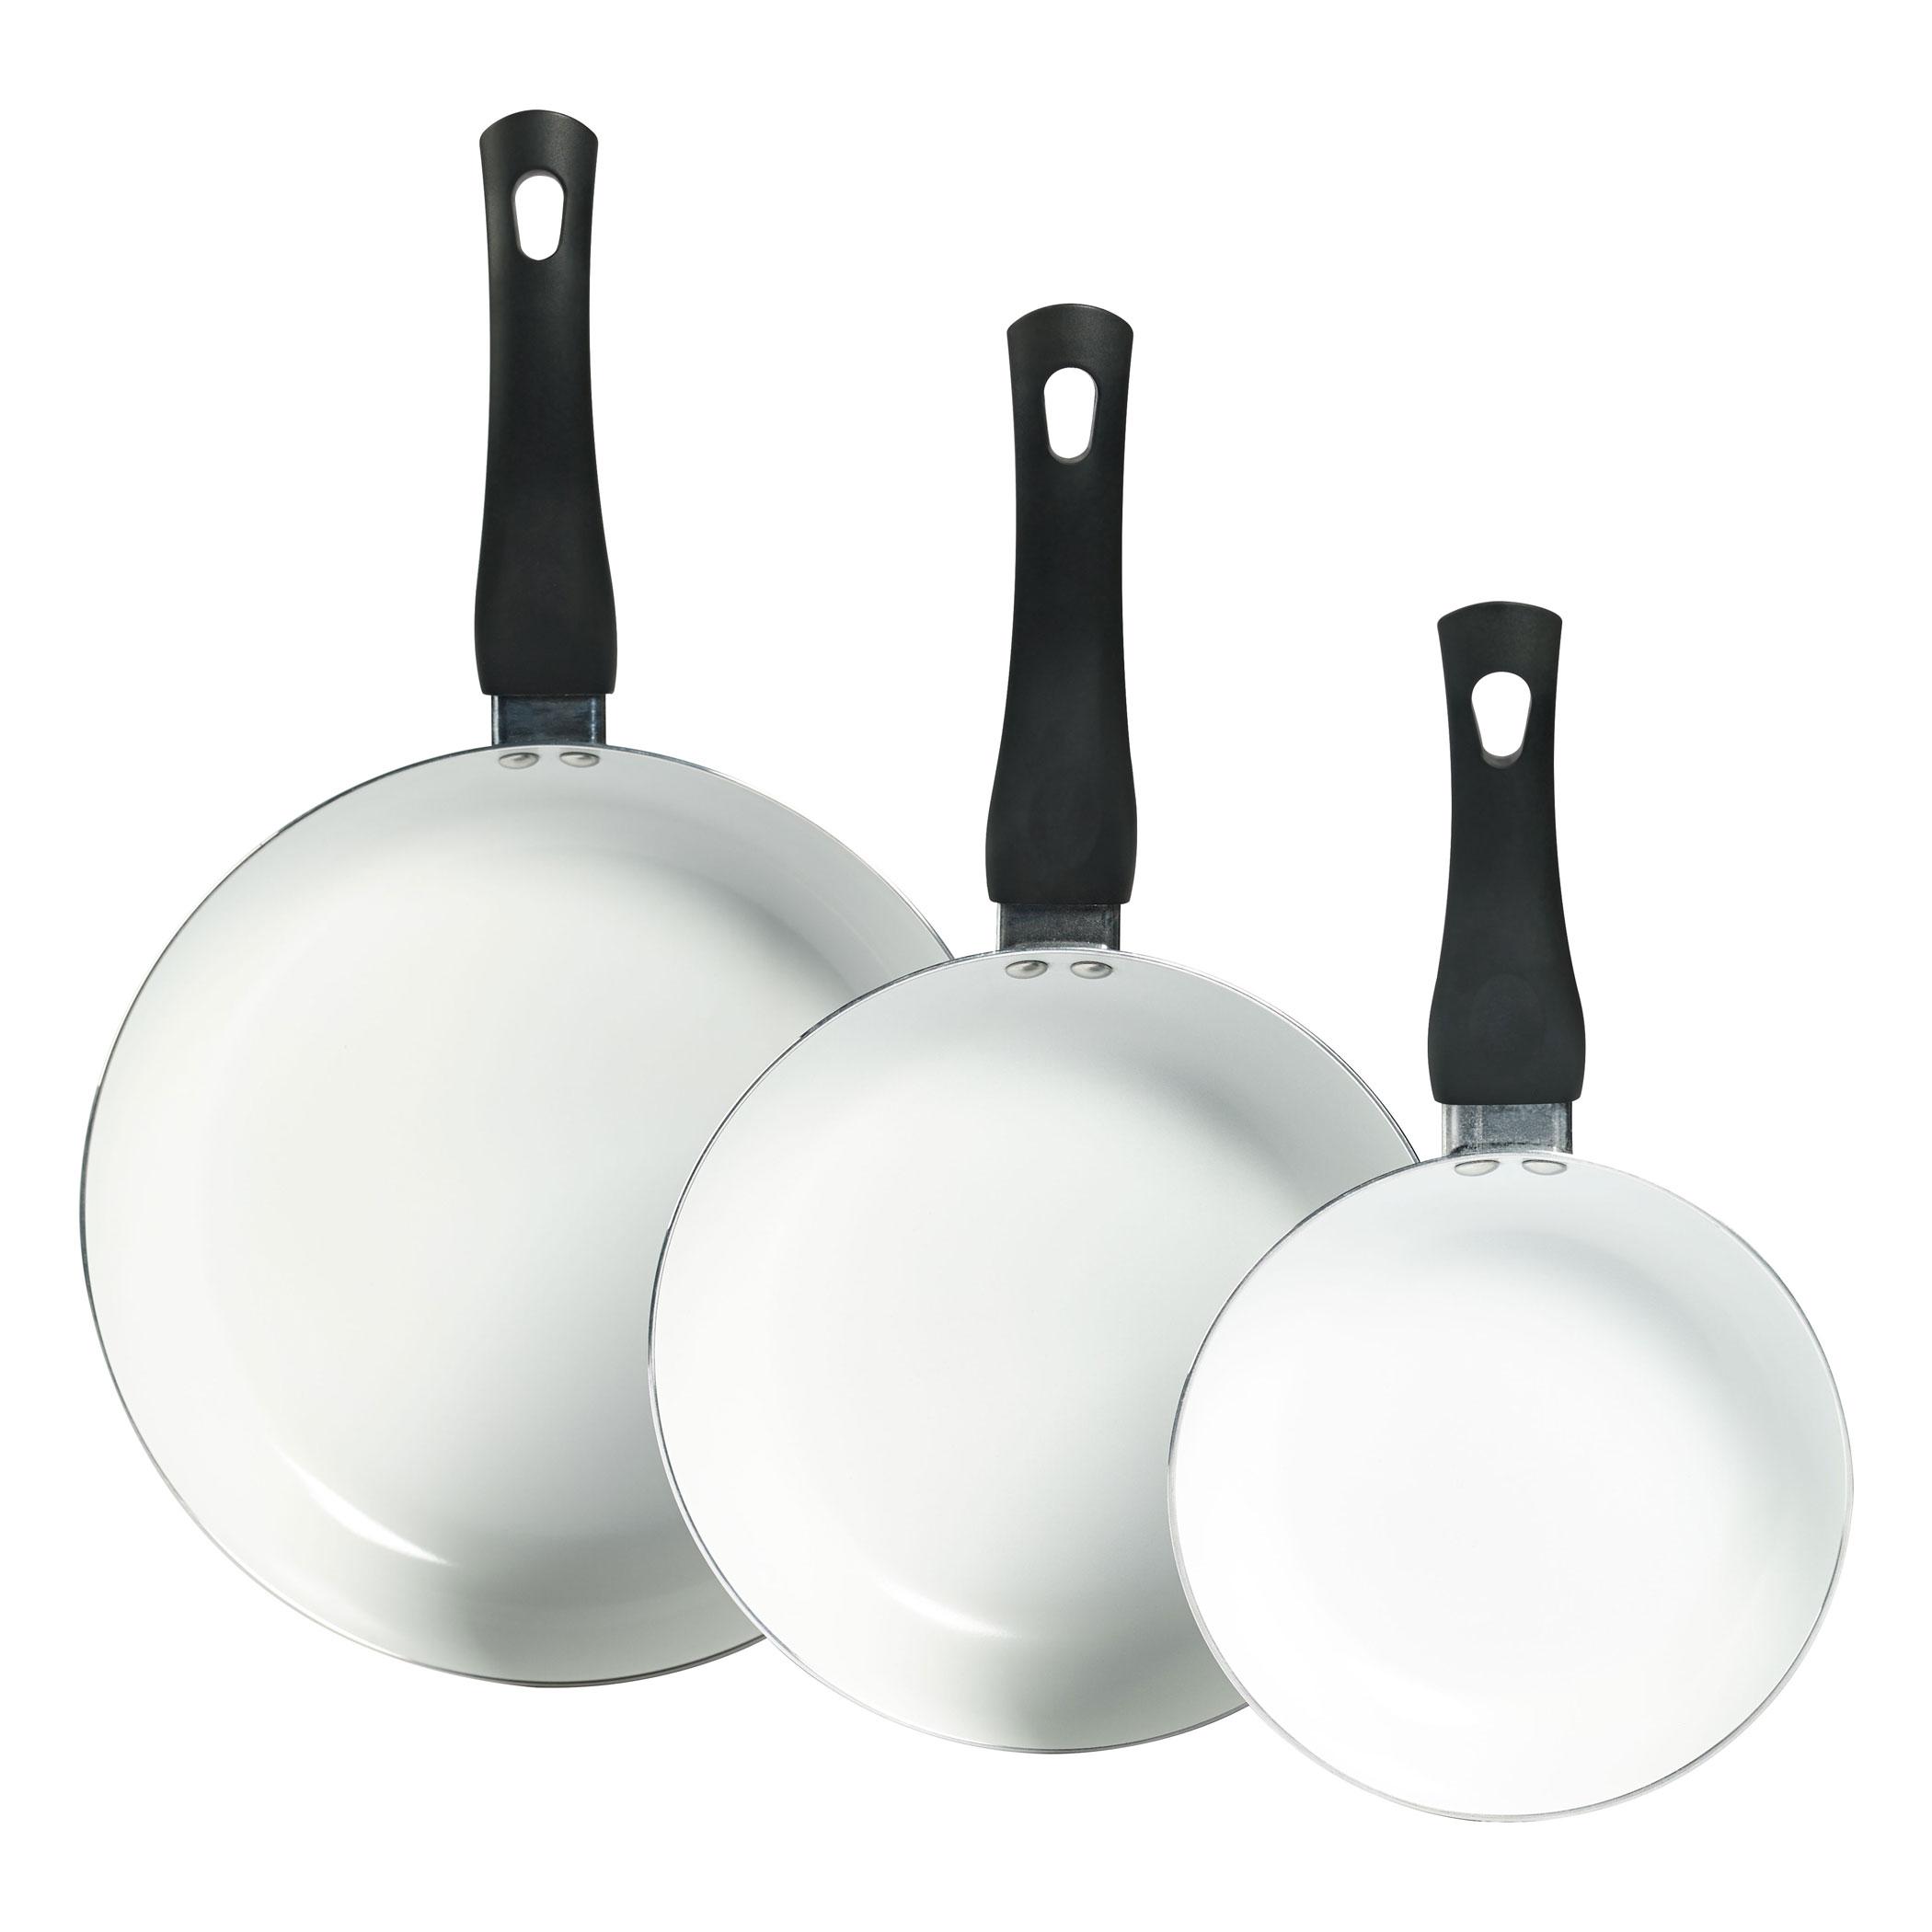 Set Of 3 Ceramic Non Stick Aluminum Fry Pans By Basic